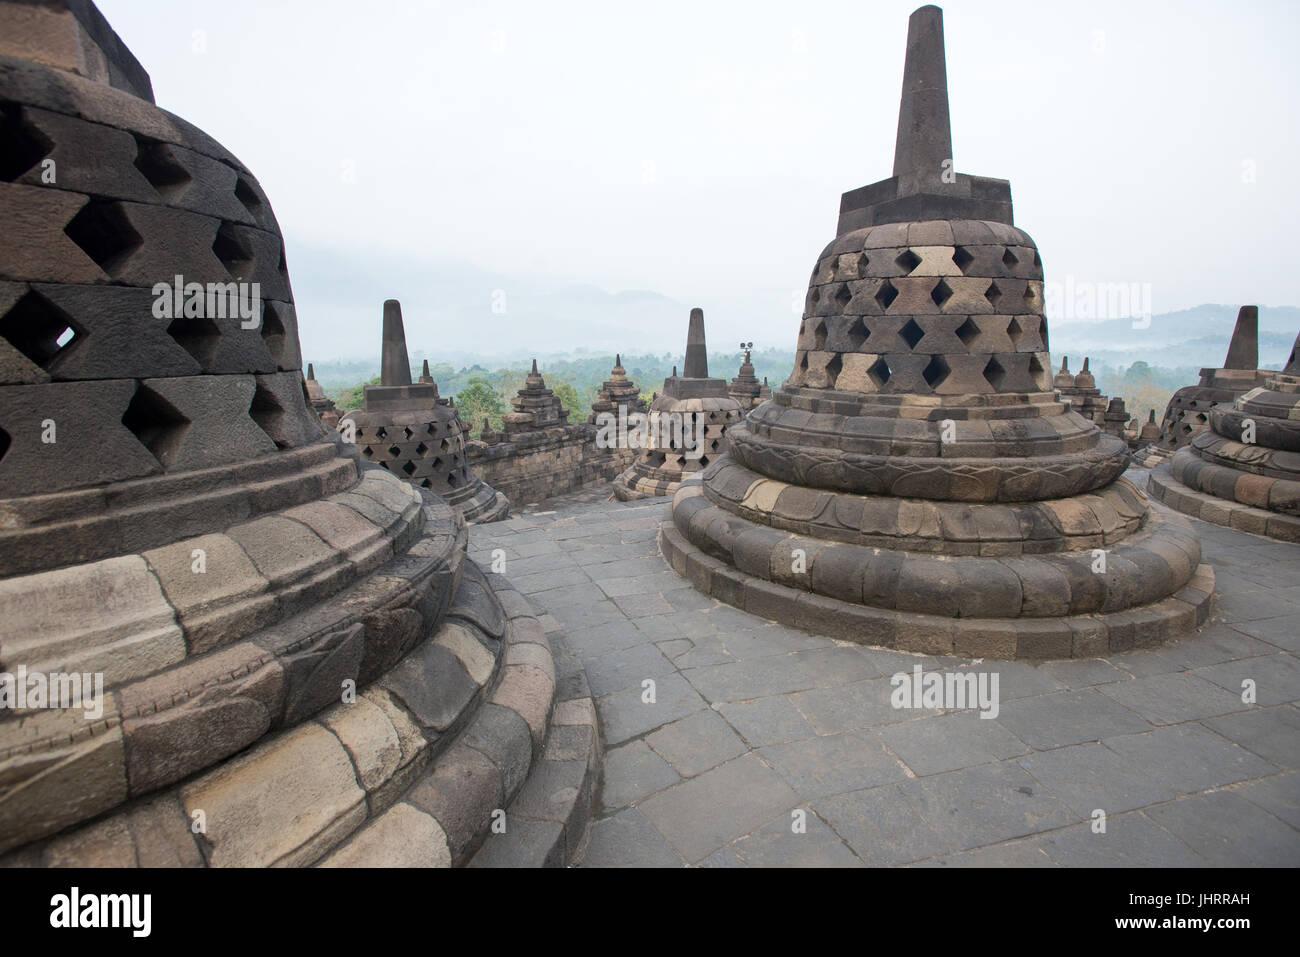 Sea of Immortality terrace of Borobudur Temple Java Indonesia. - Stock Image